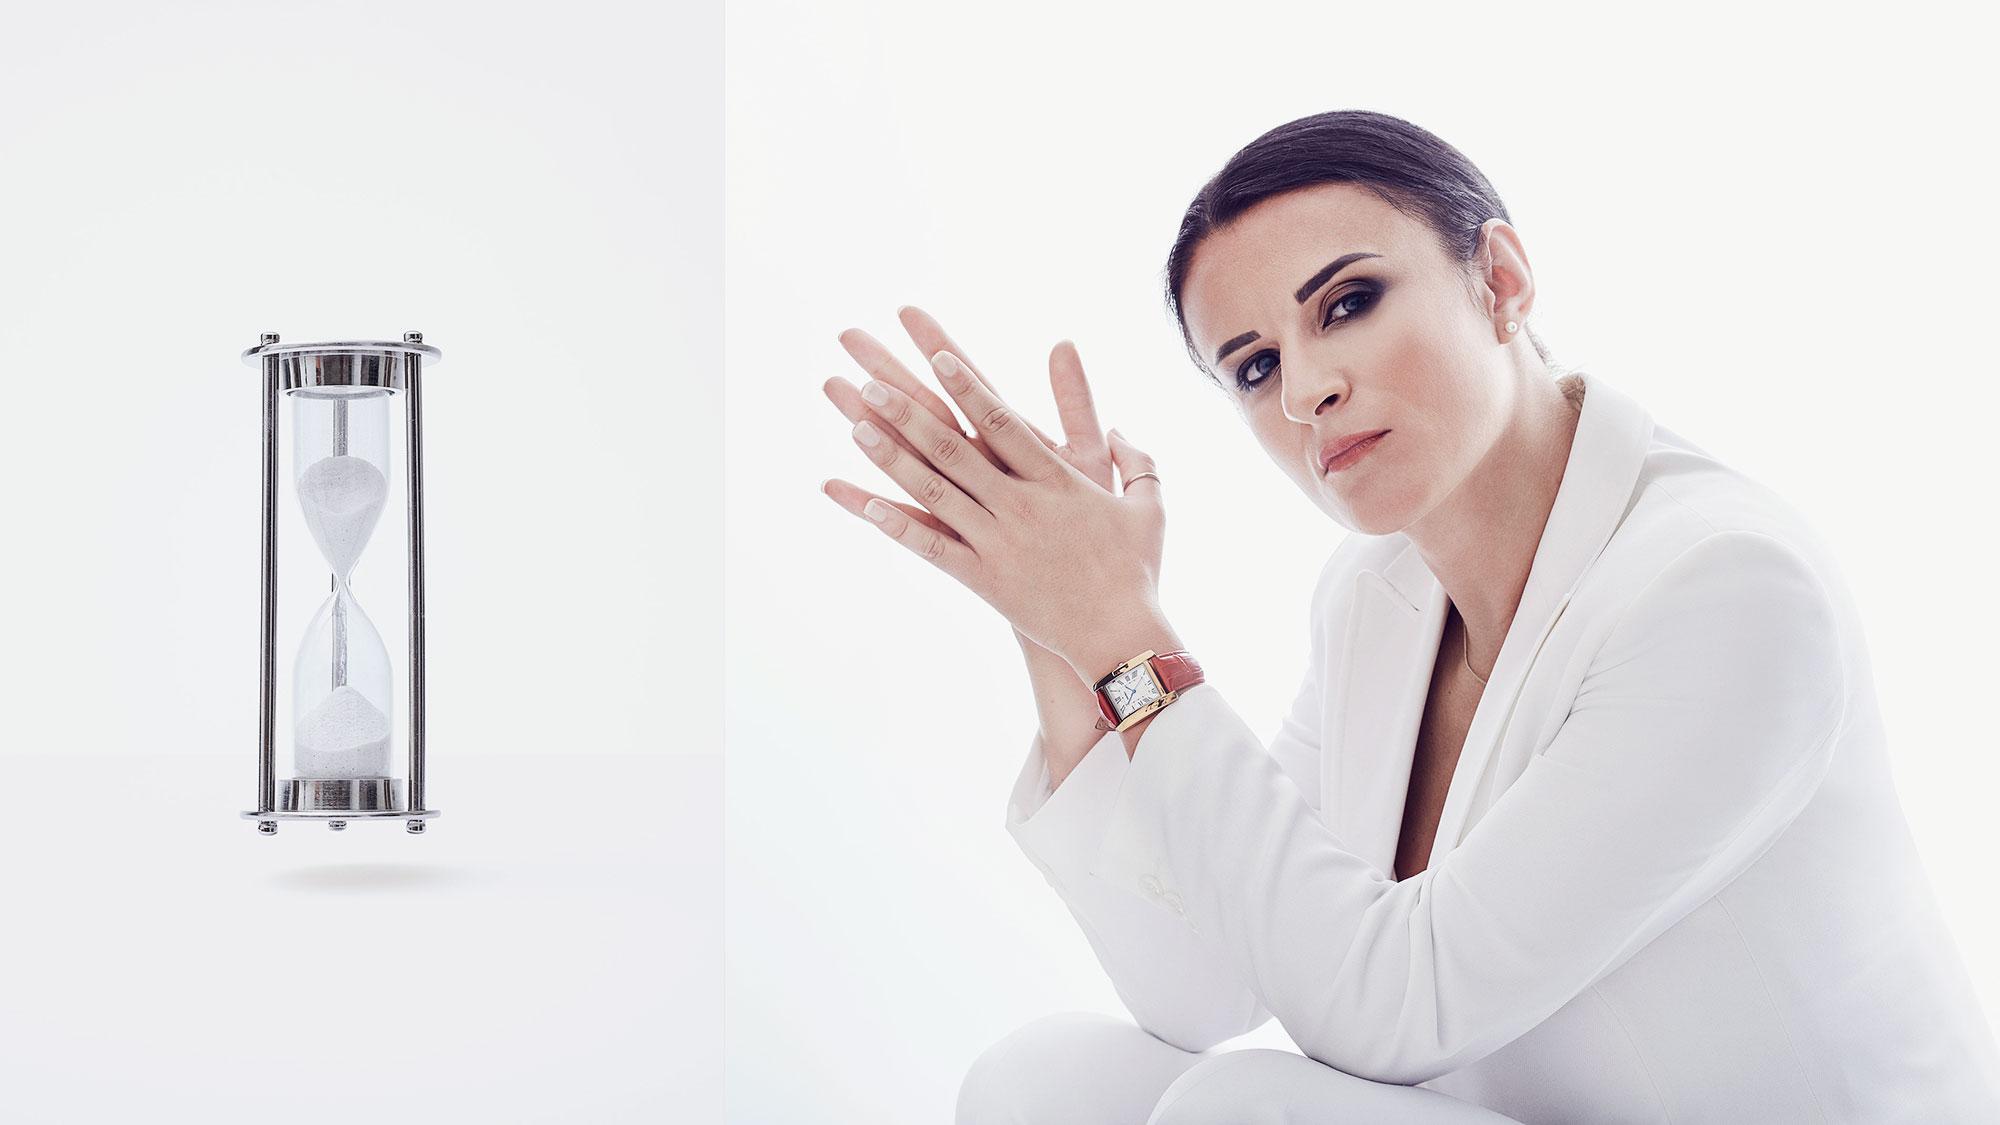 Natalie-Jakomis-women-in-data-sane-seven-creative-portrait-2000-px-wide